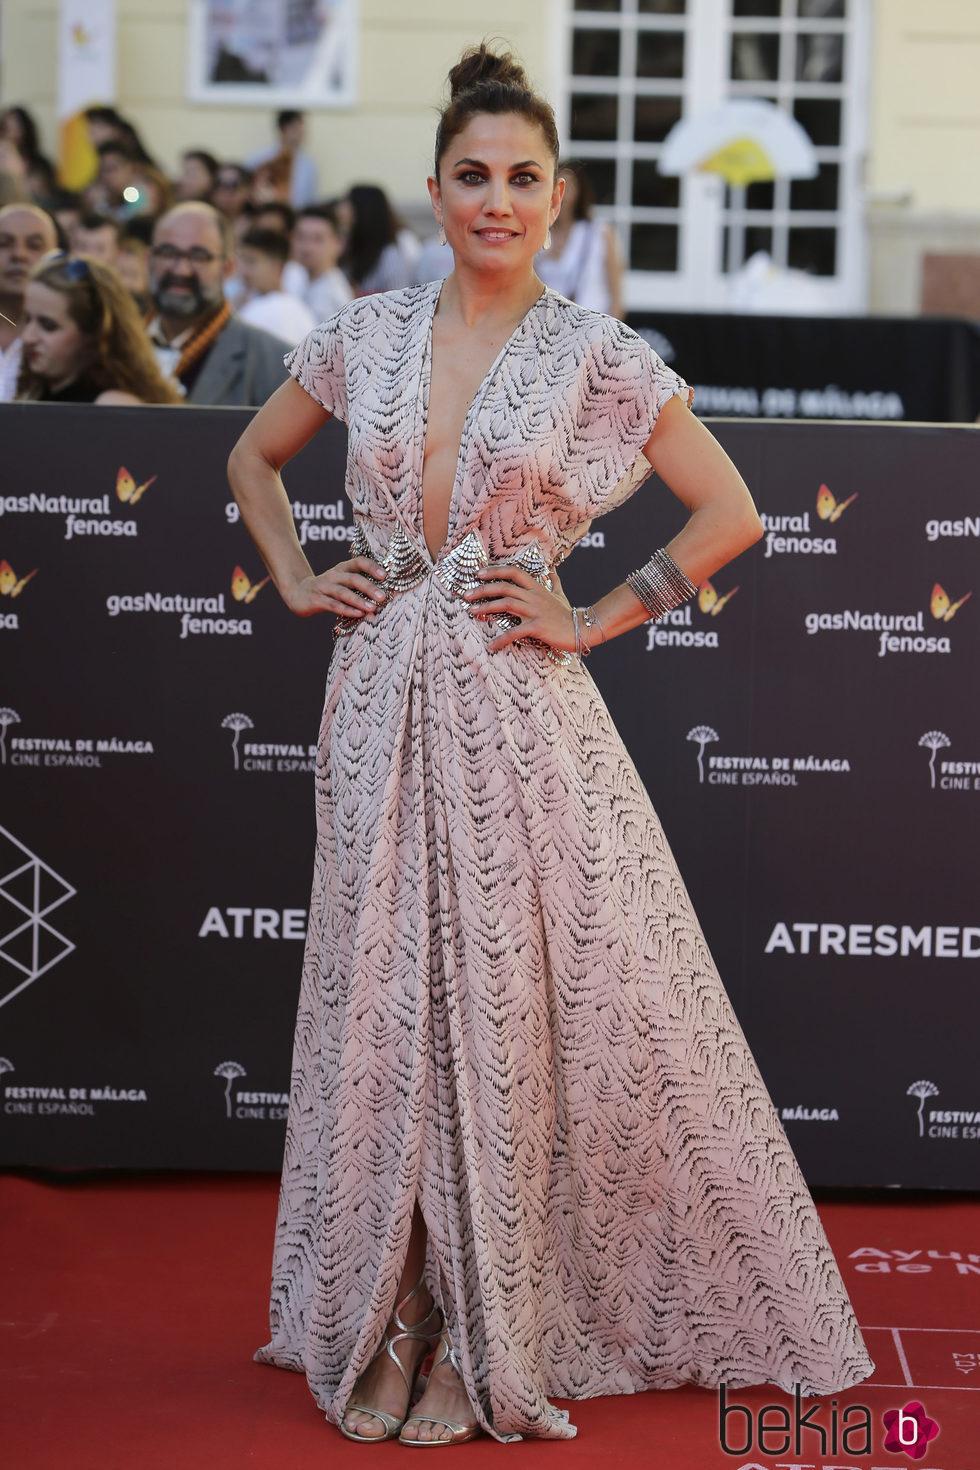 Toni Acosta en la clausura del Festival de Málaga 2016